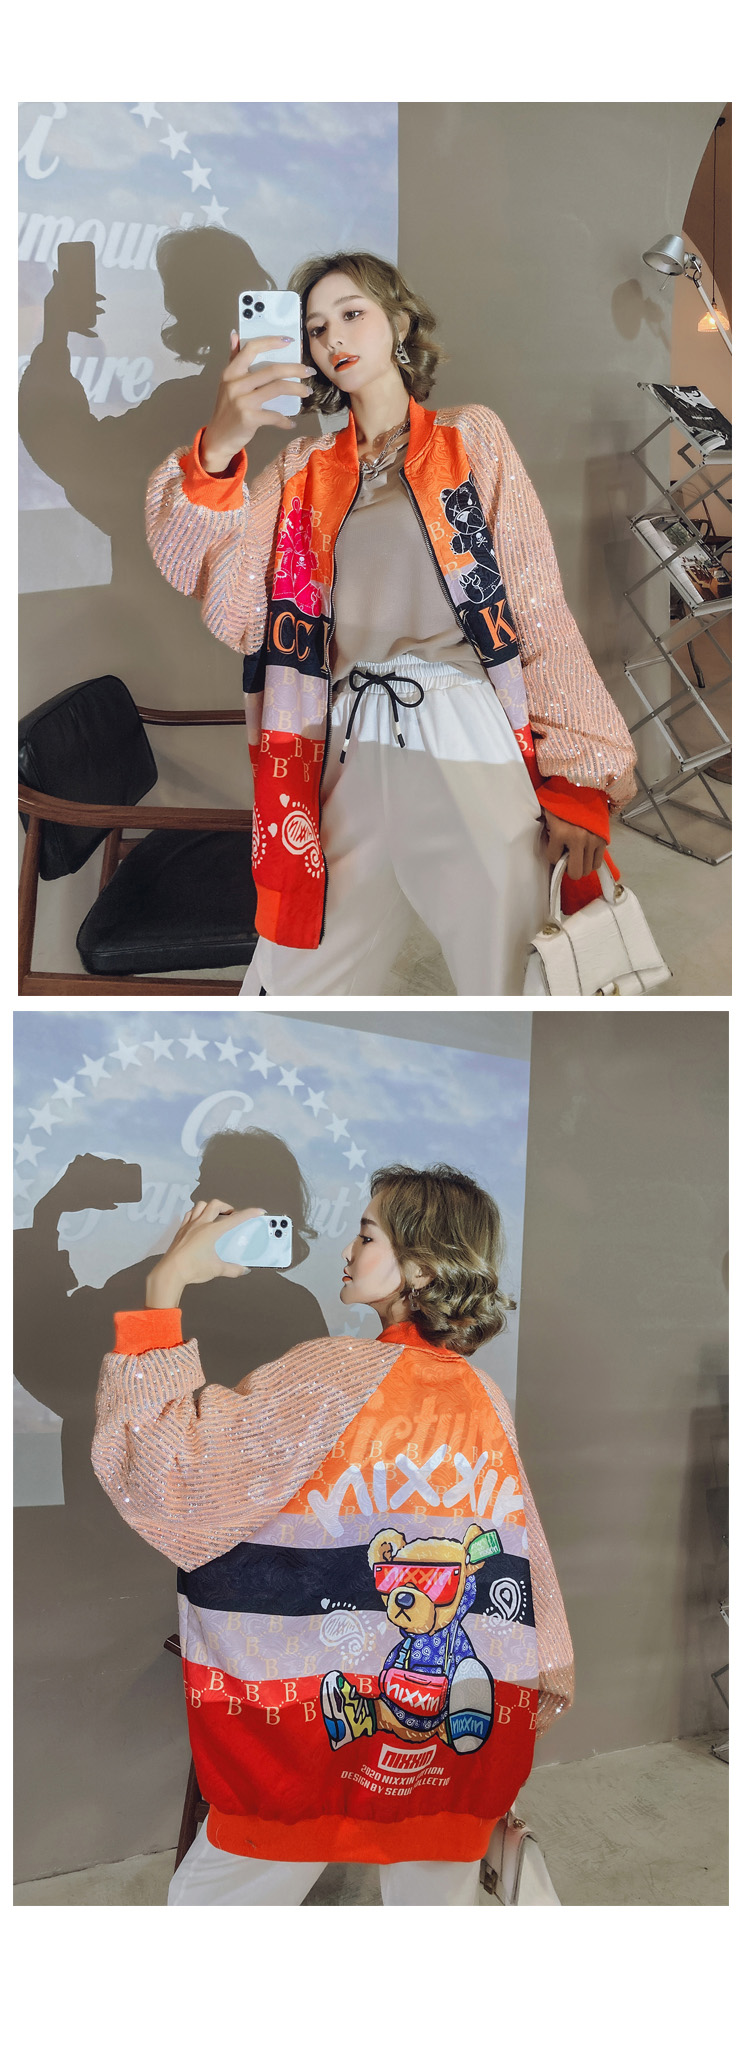 Hd7f76bb5e528406c8213fe65e9f6c074W 2021 Spring Women Long Sequins Print Patchwork Loose Coat